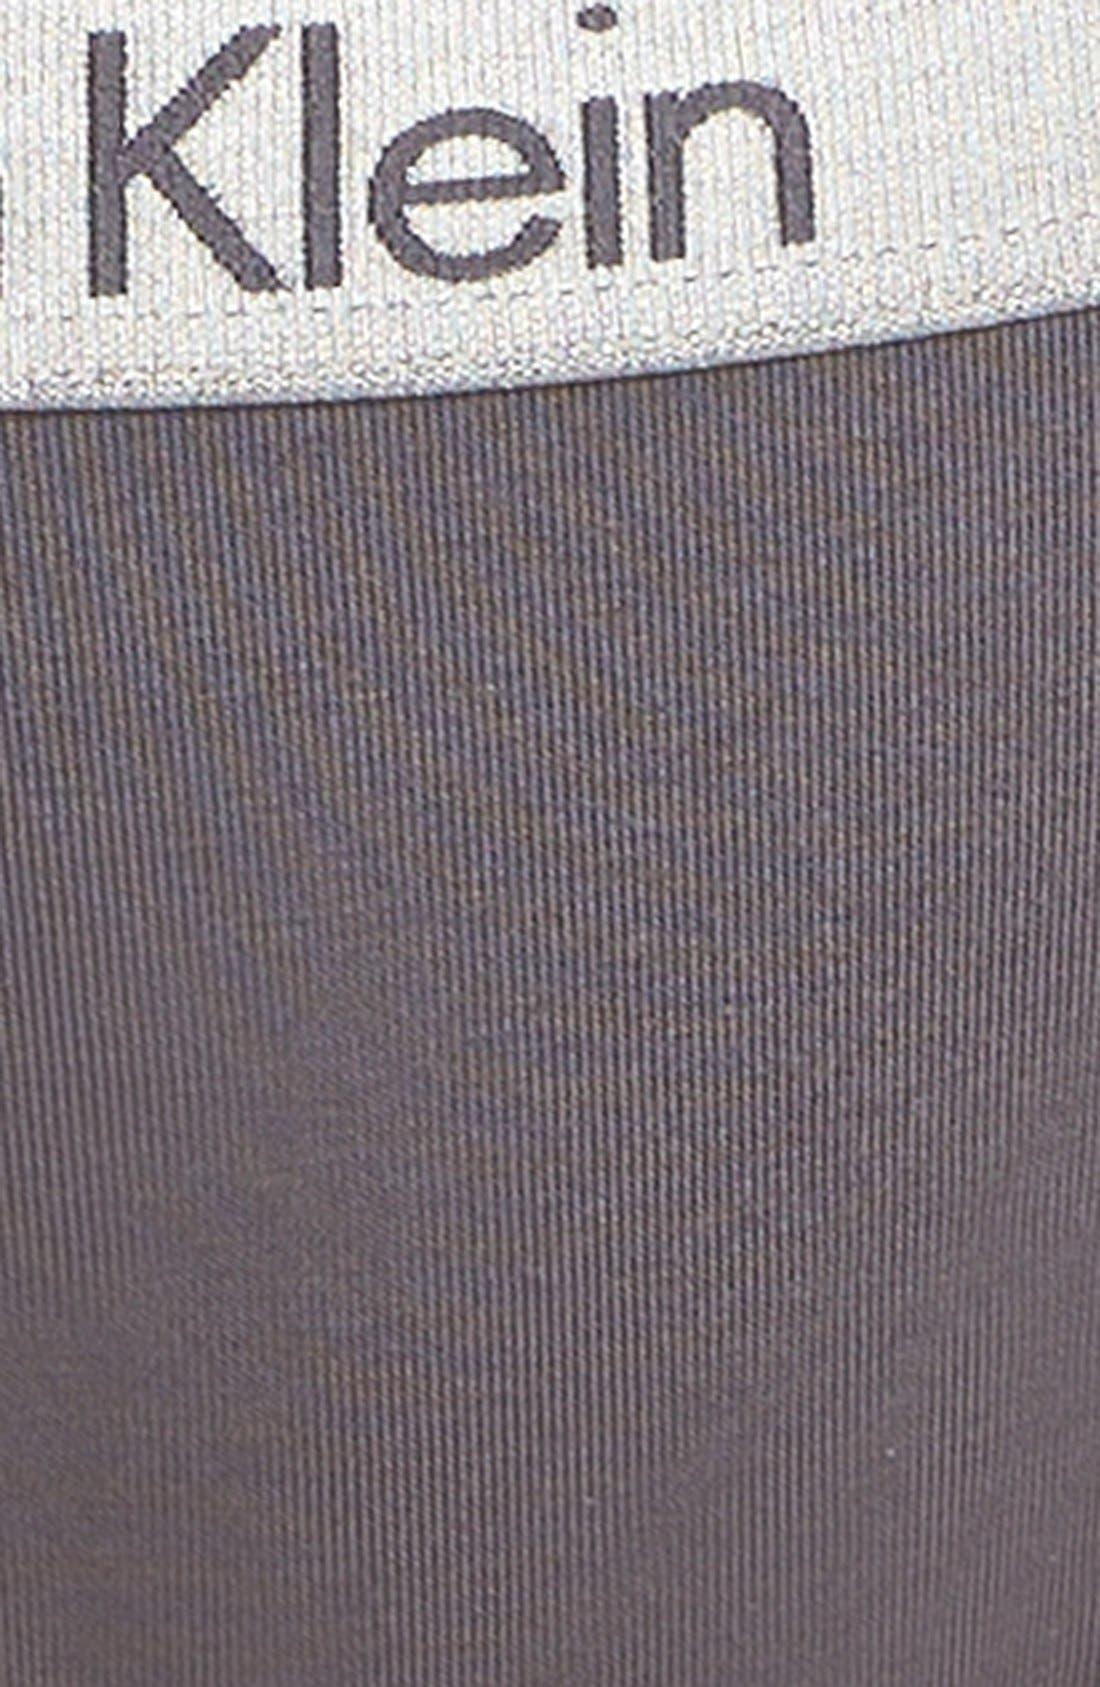 'Radiant' Cotton Thong,                             Alternate thumbnail 83, color,